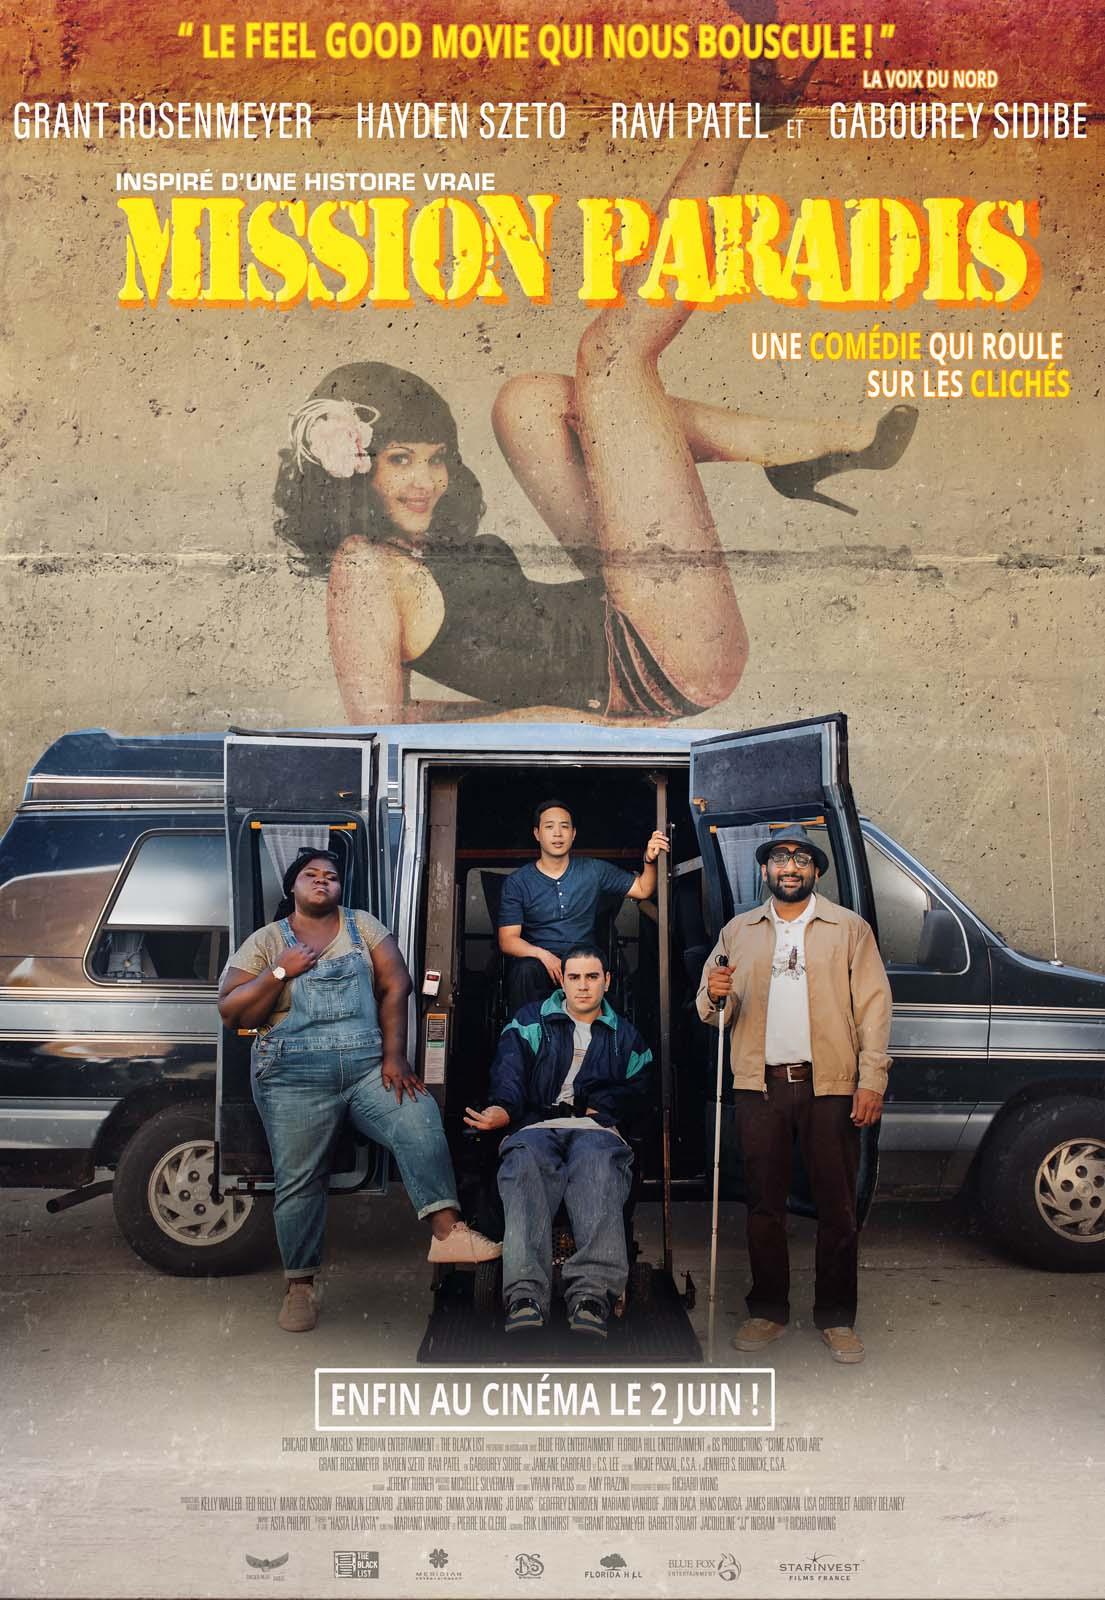 Mission Paradis